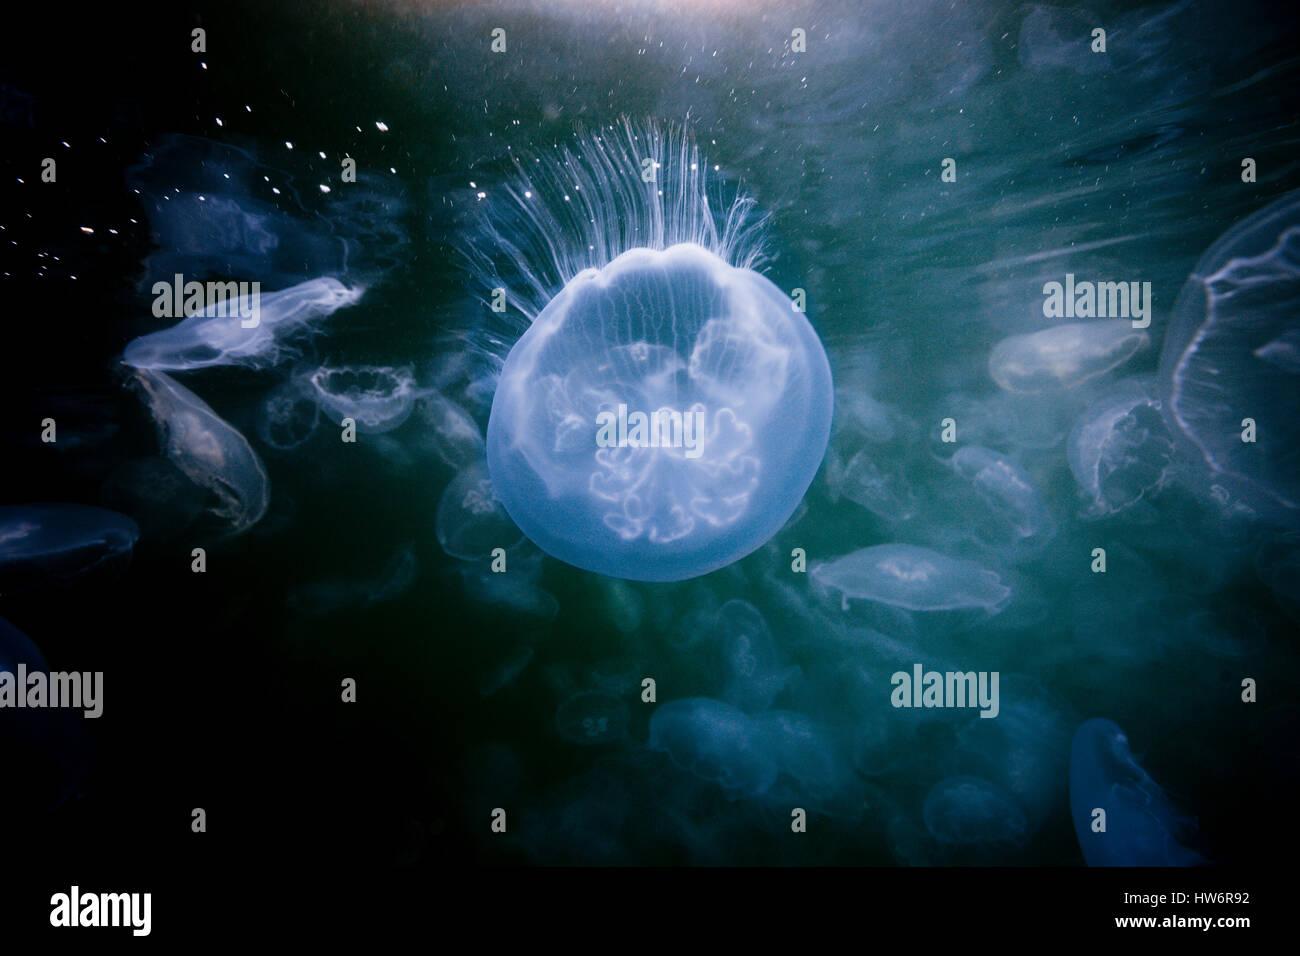 Moon Jellyfish, Aurelia aurita, Raja Ampat, West Papua, Indonesia - Stock Image